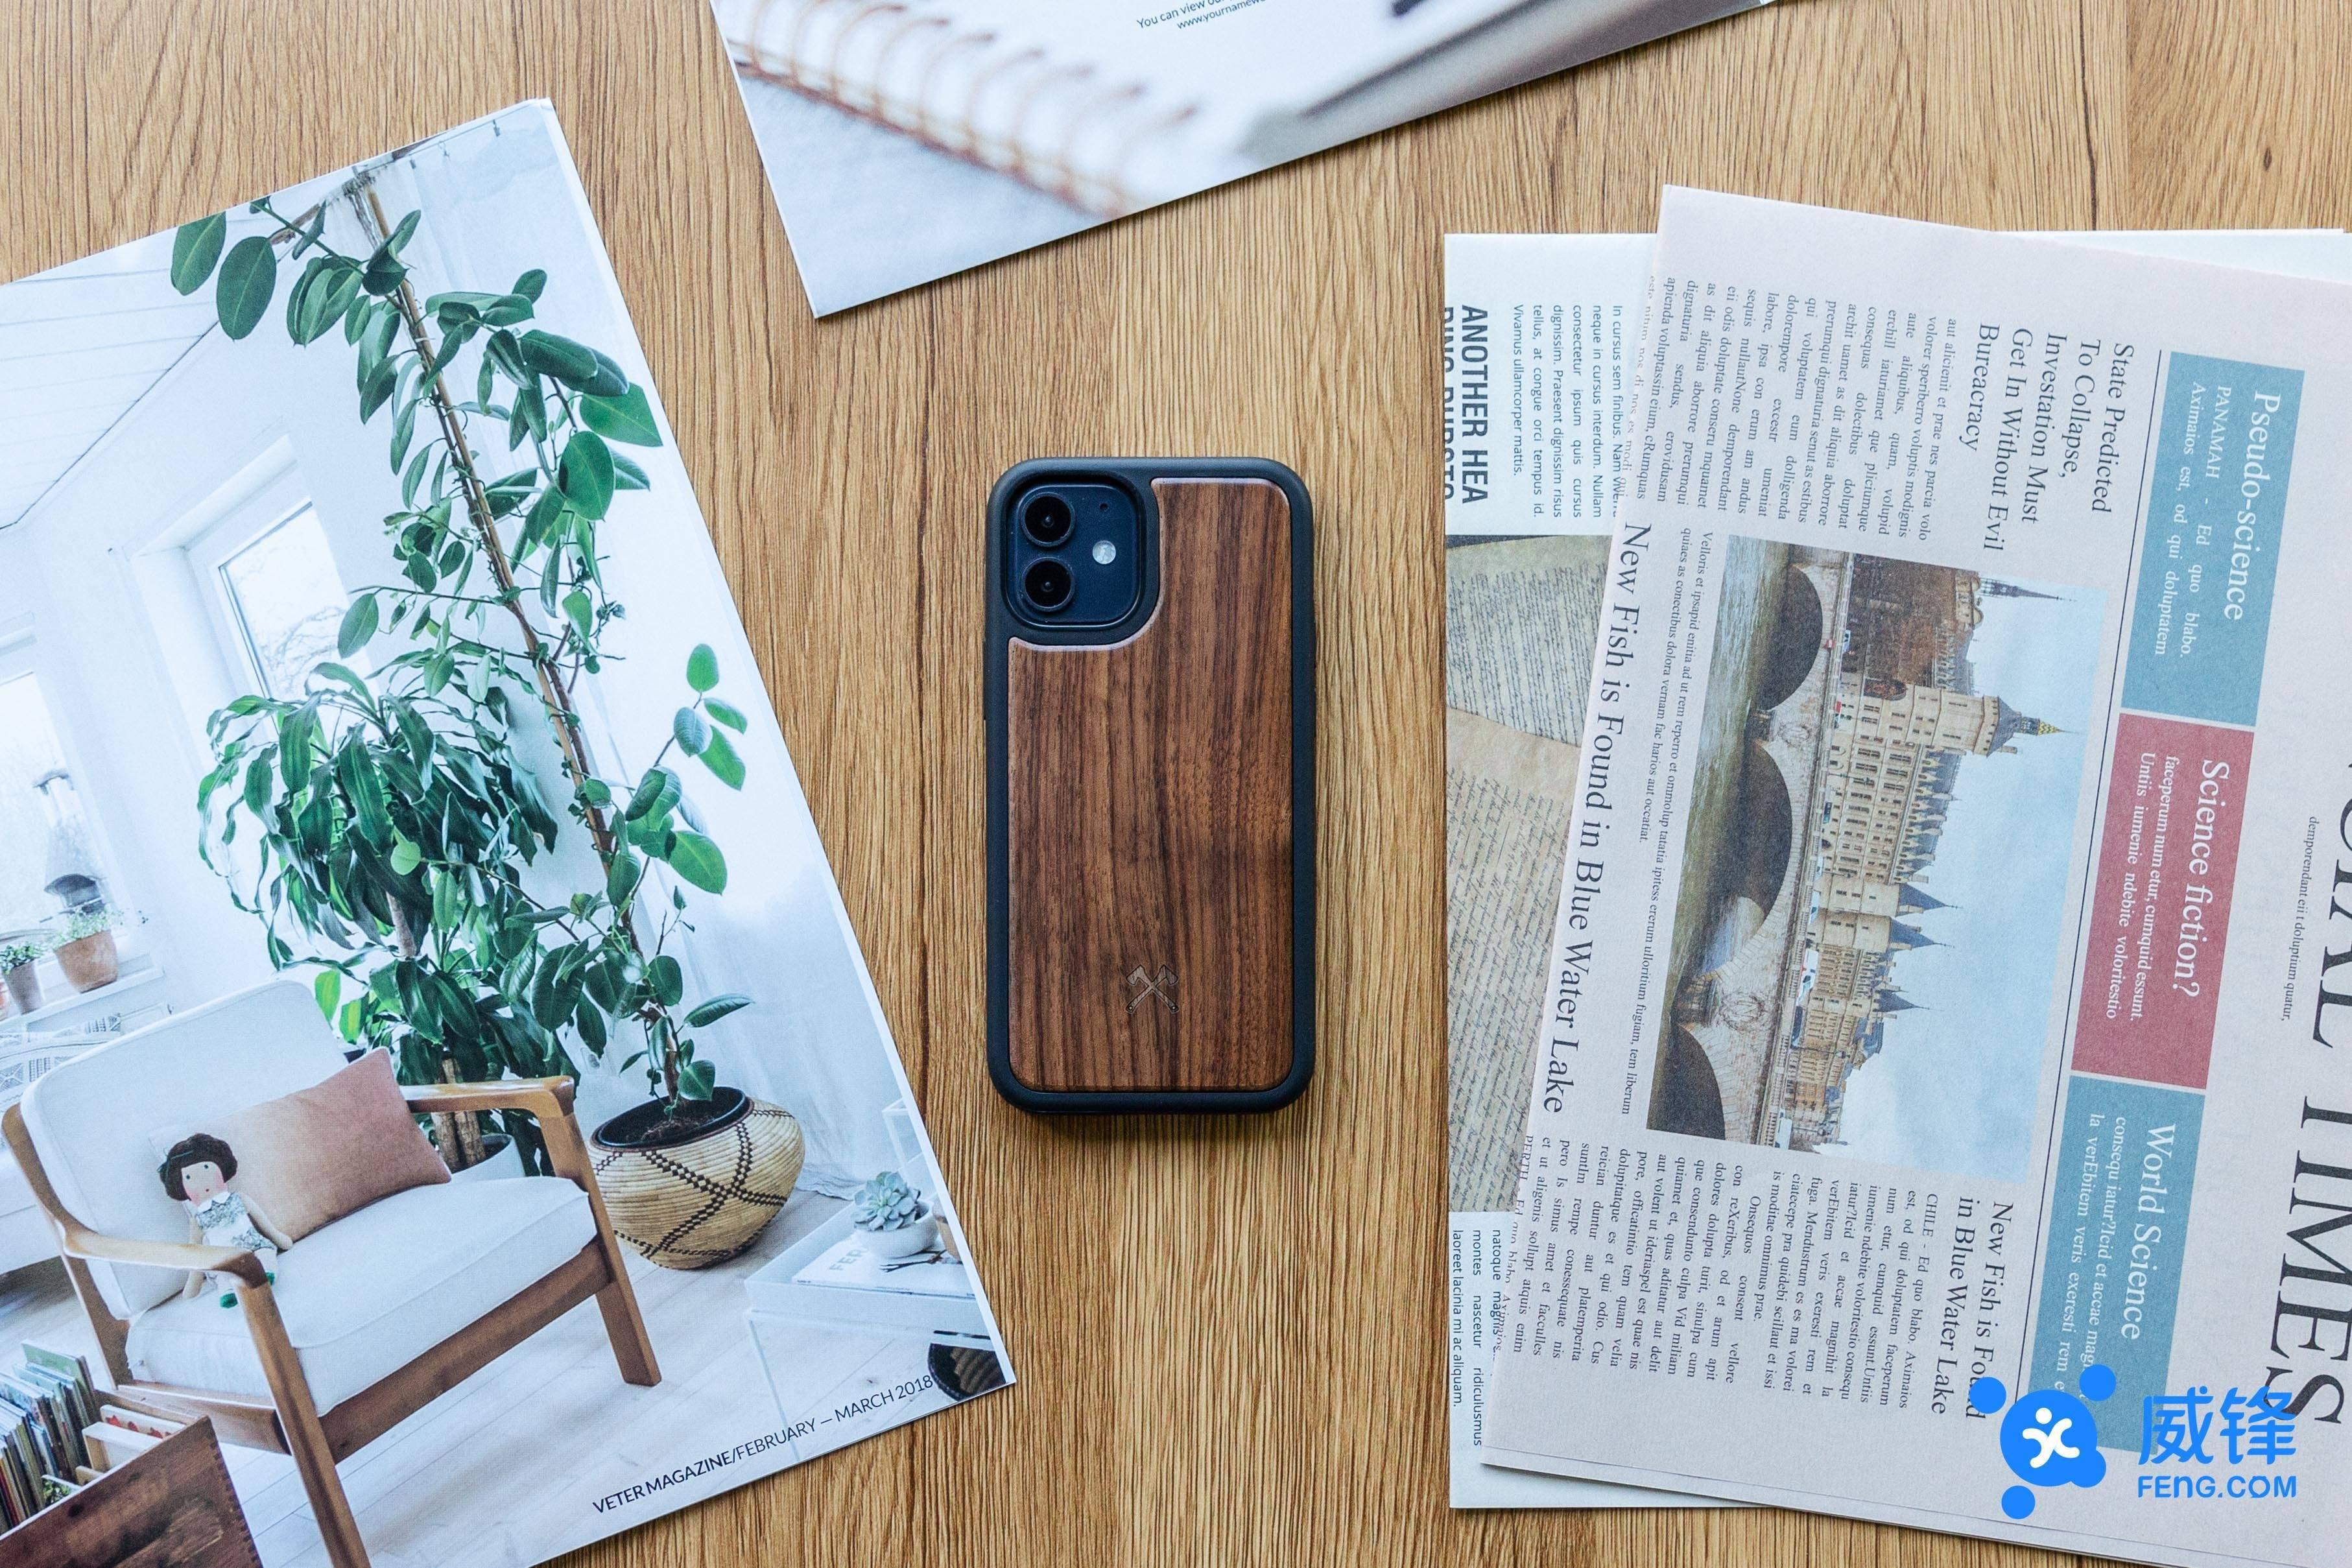 WOODCESSORIE 生态系列保护壳图赏:你的第一个 iPhone 12 保护壳?